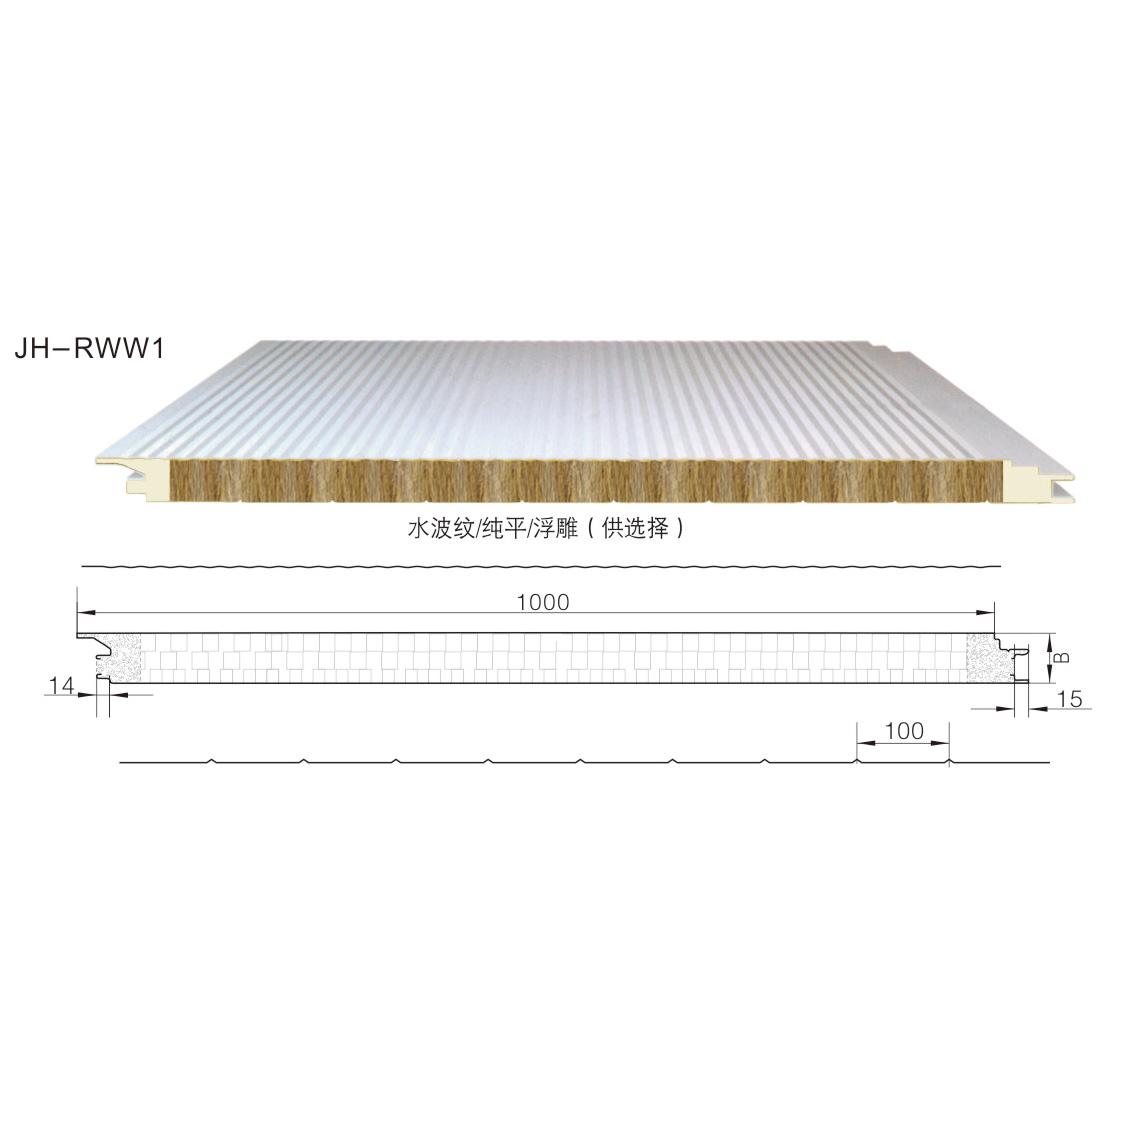 PU封边岩棉墙面夹芯板JH-RWW1